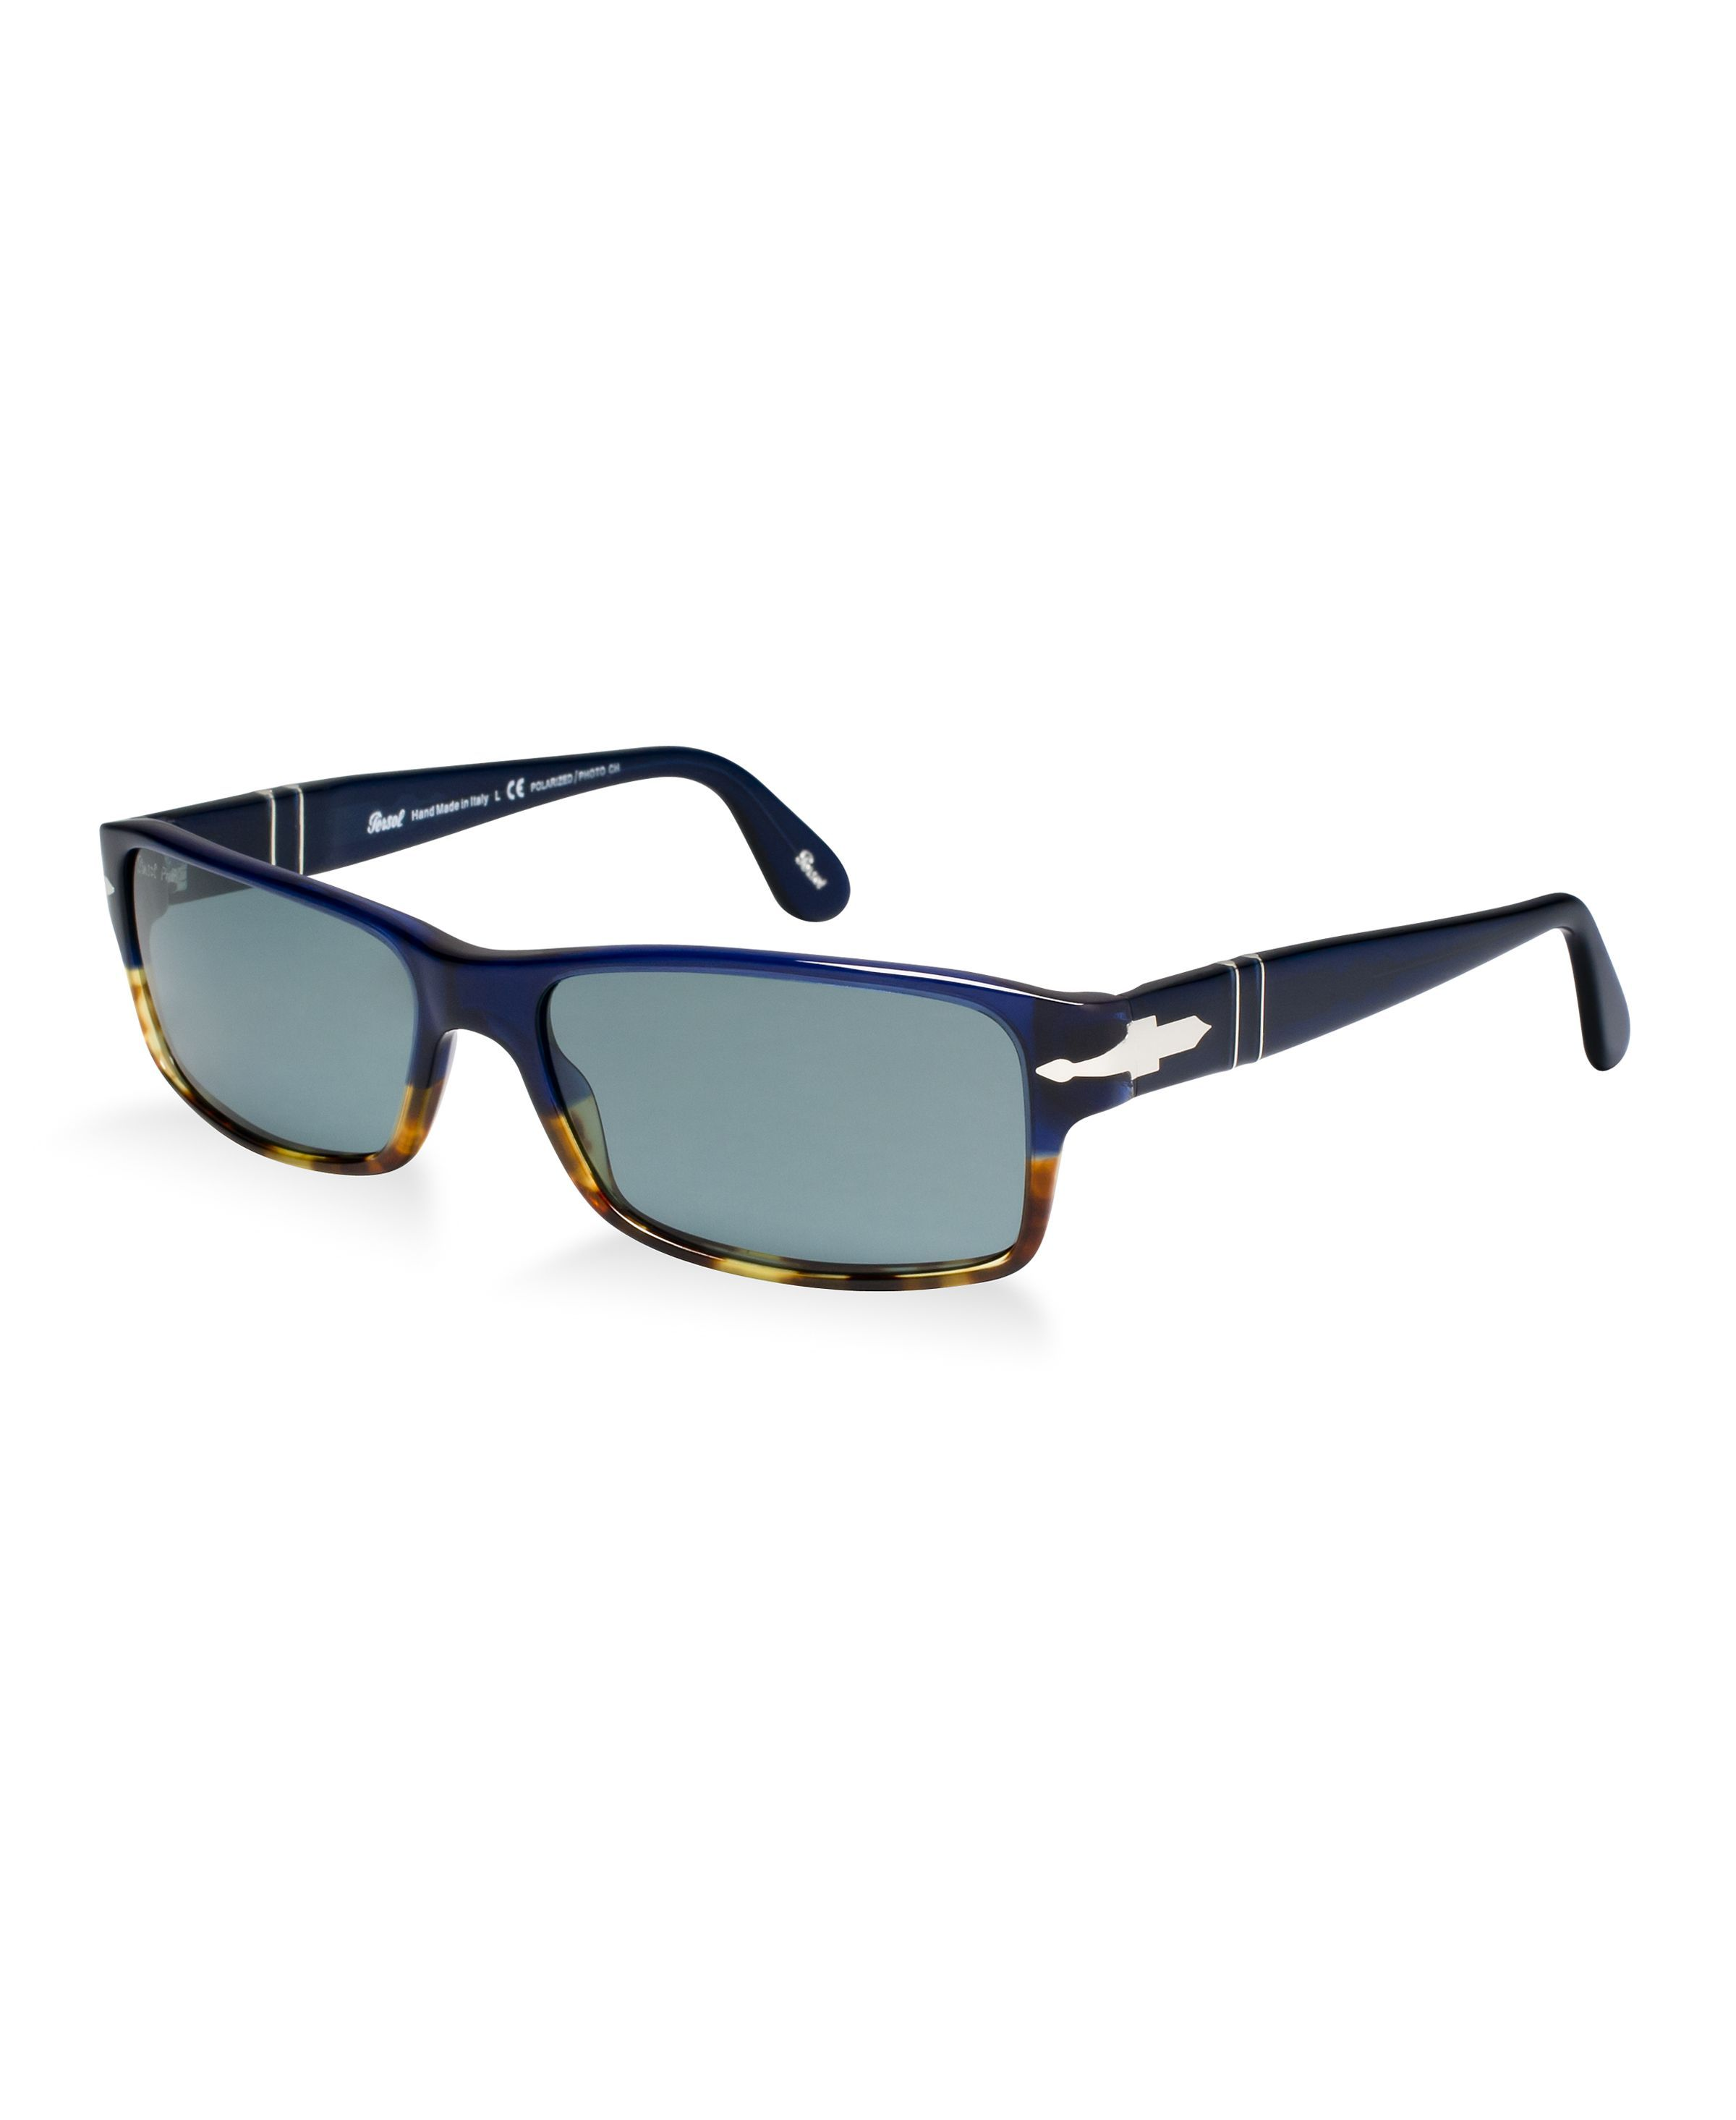 CHOPPERS Gafas Sol UVAB CE Moto Custom Biker Sunglasses lunettes occhiali